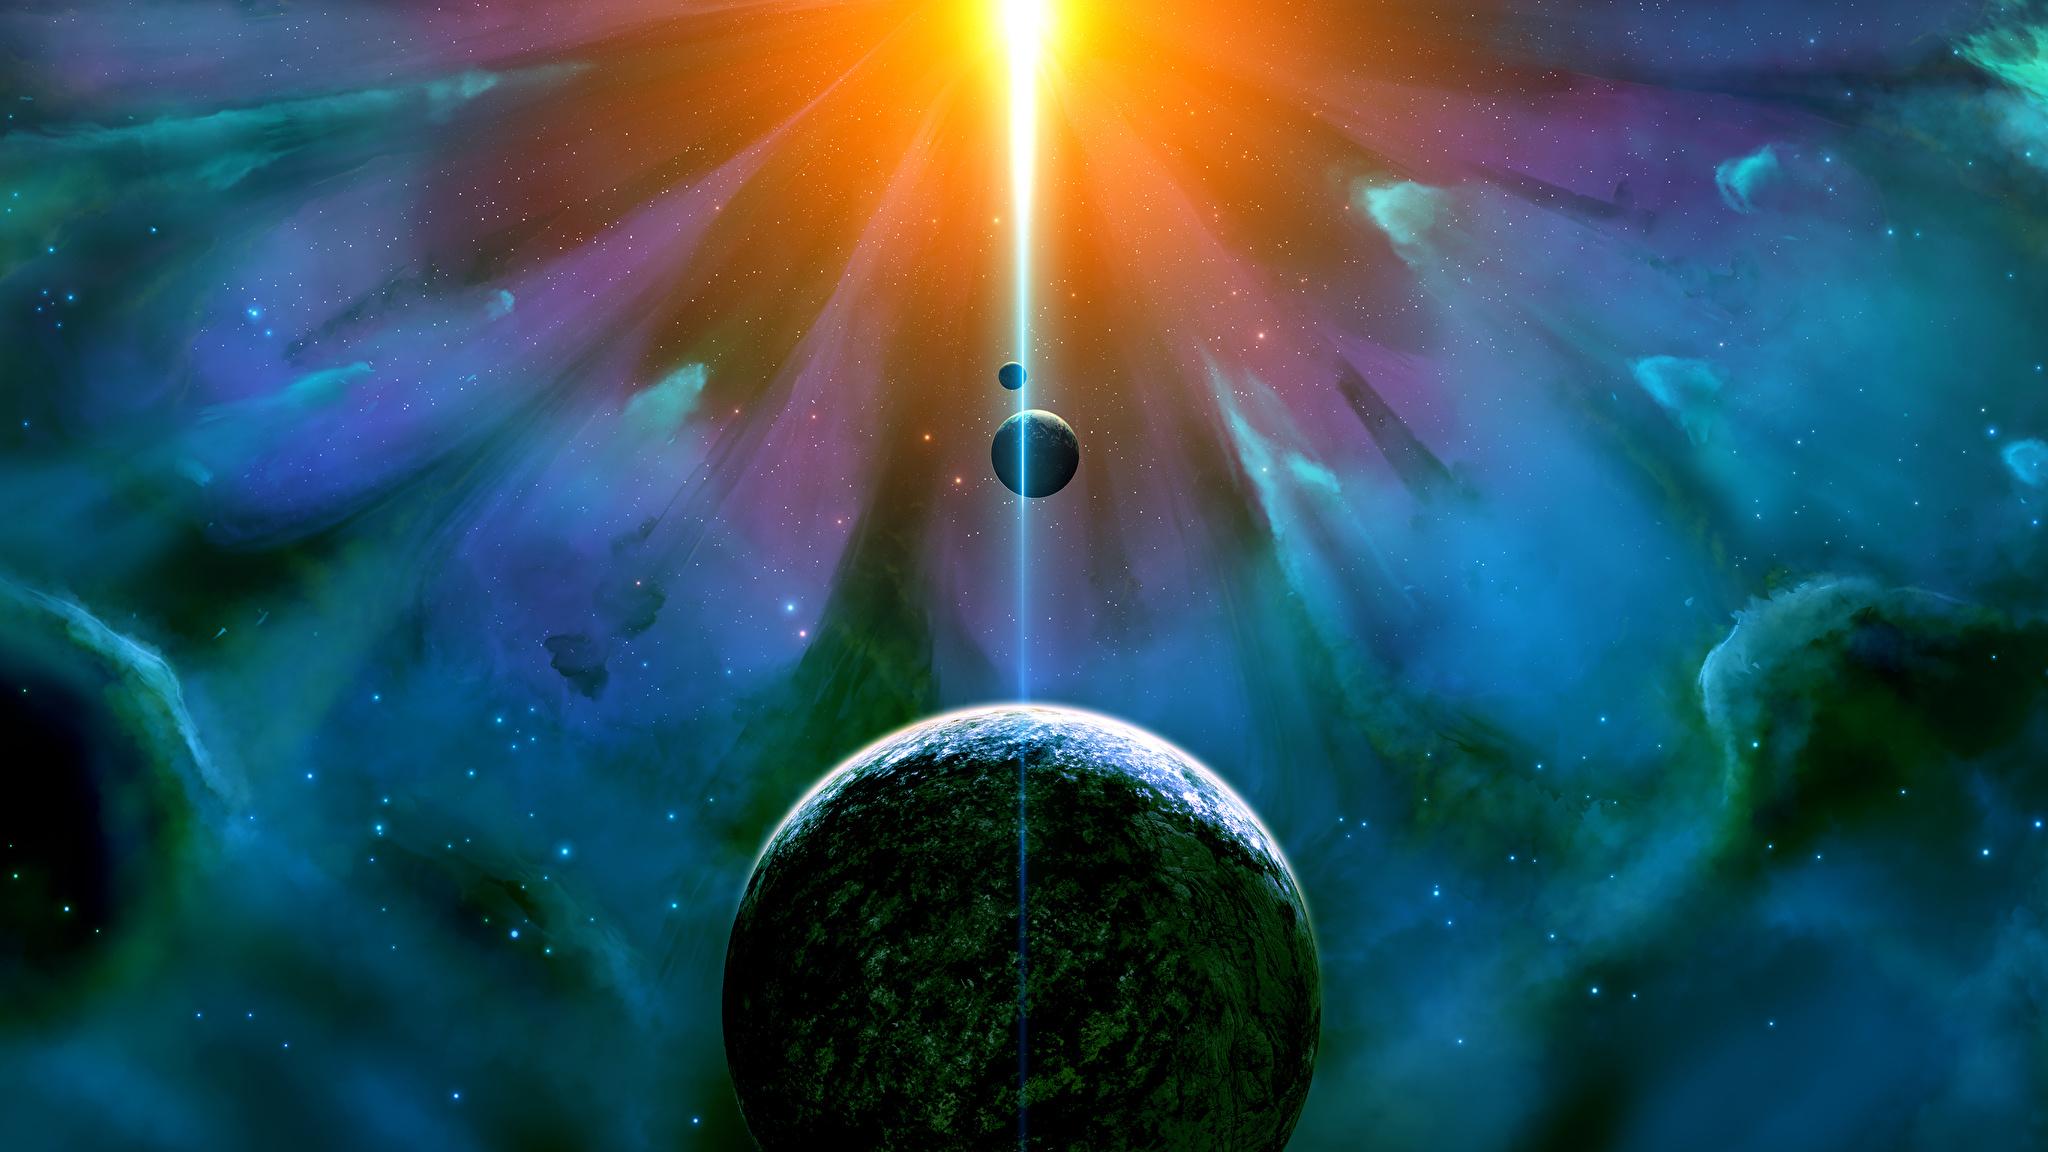 Fonds Decran 2048x1152 Planètes Nébuleuse No Espaço сosmos